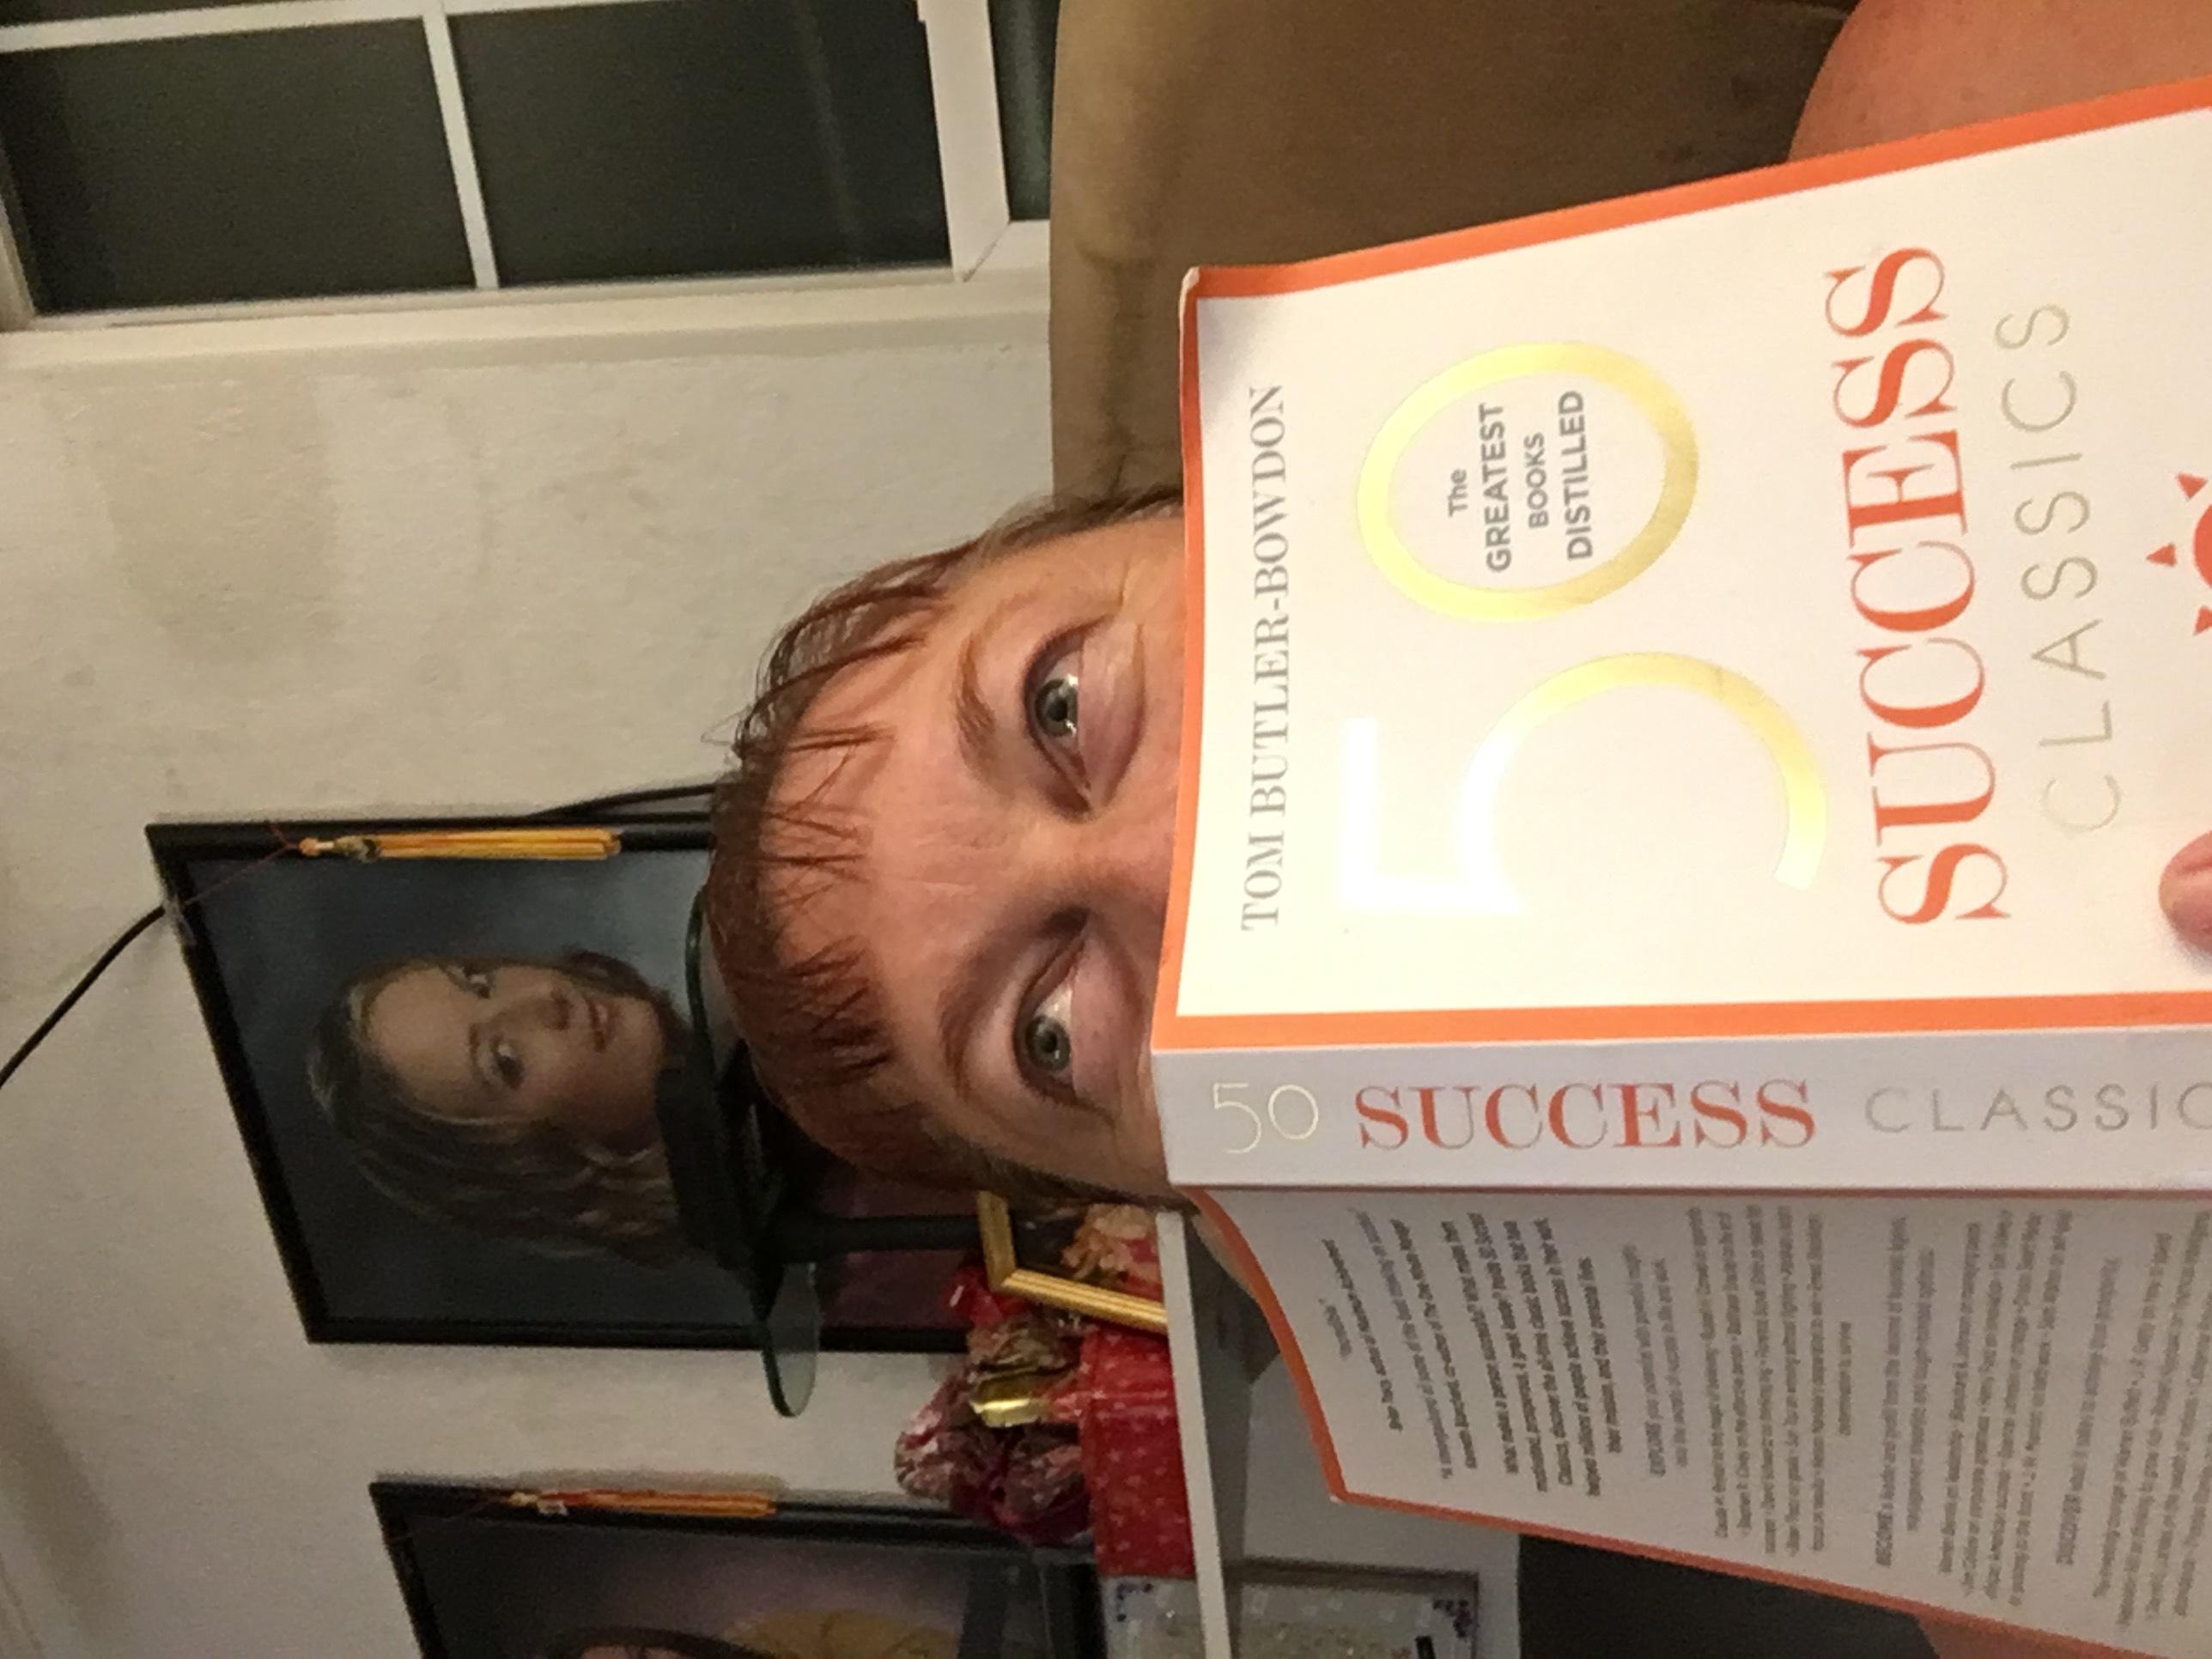 Michelle reading book